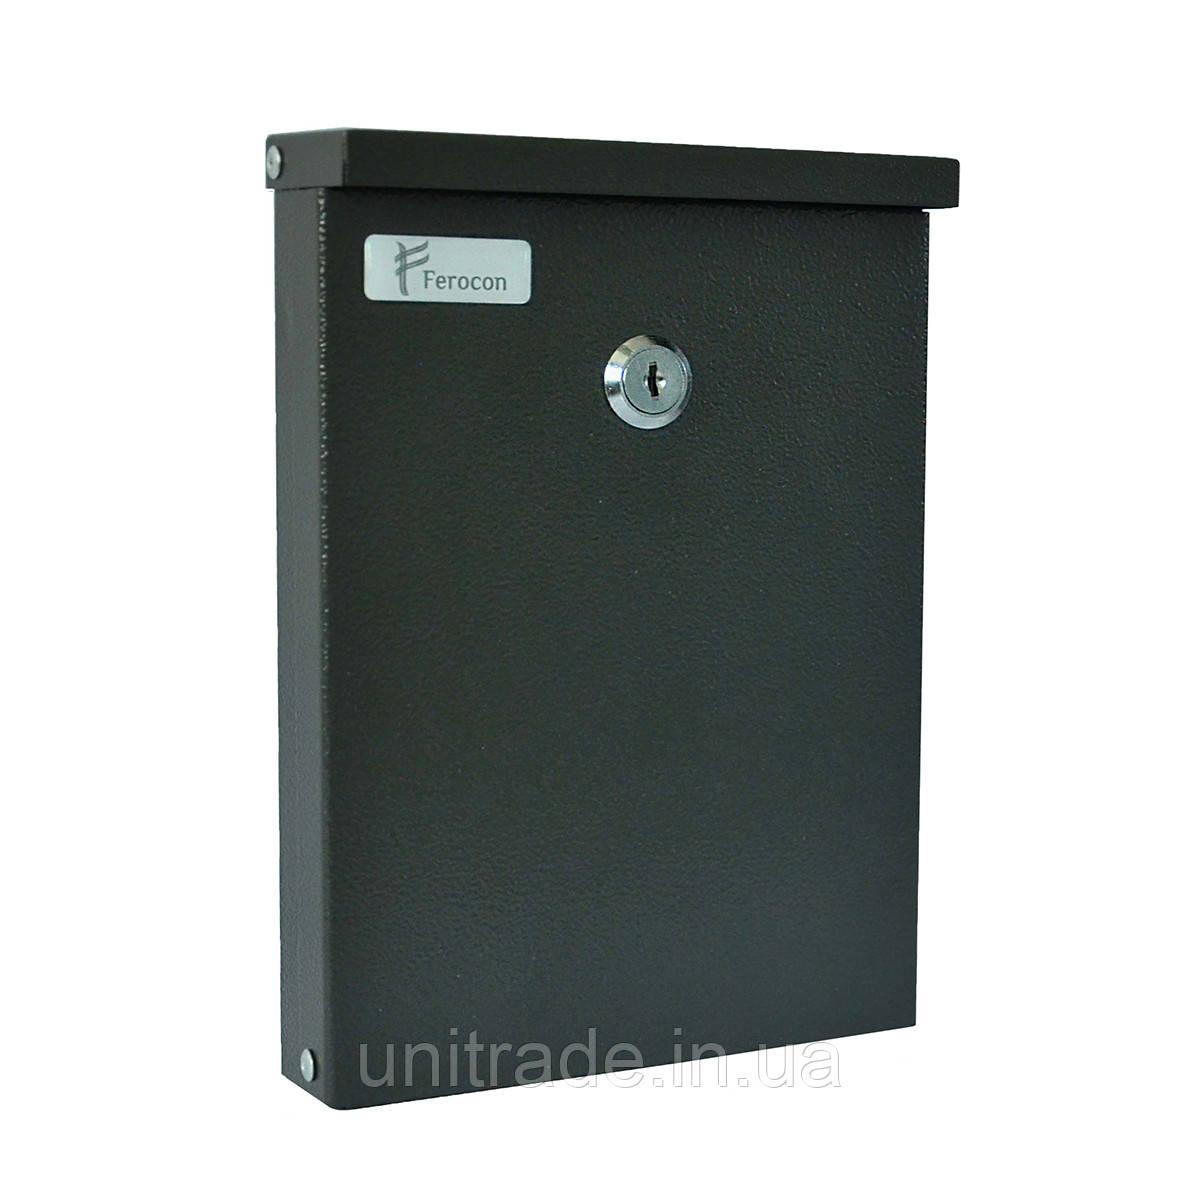 Ящик почтовый РВ-07 Ferocon, 16,7х23,3х3,6 см. серый